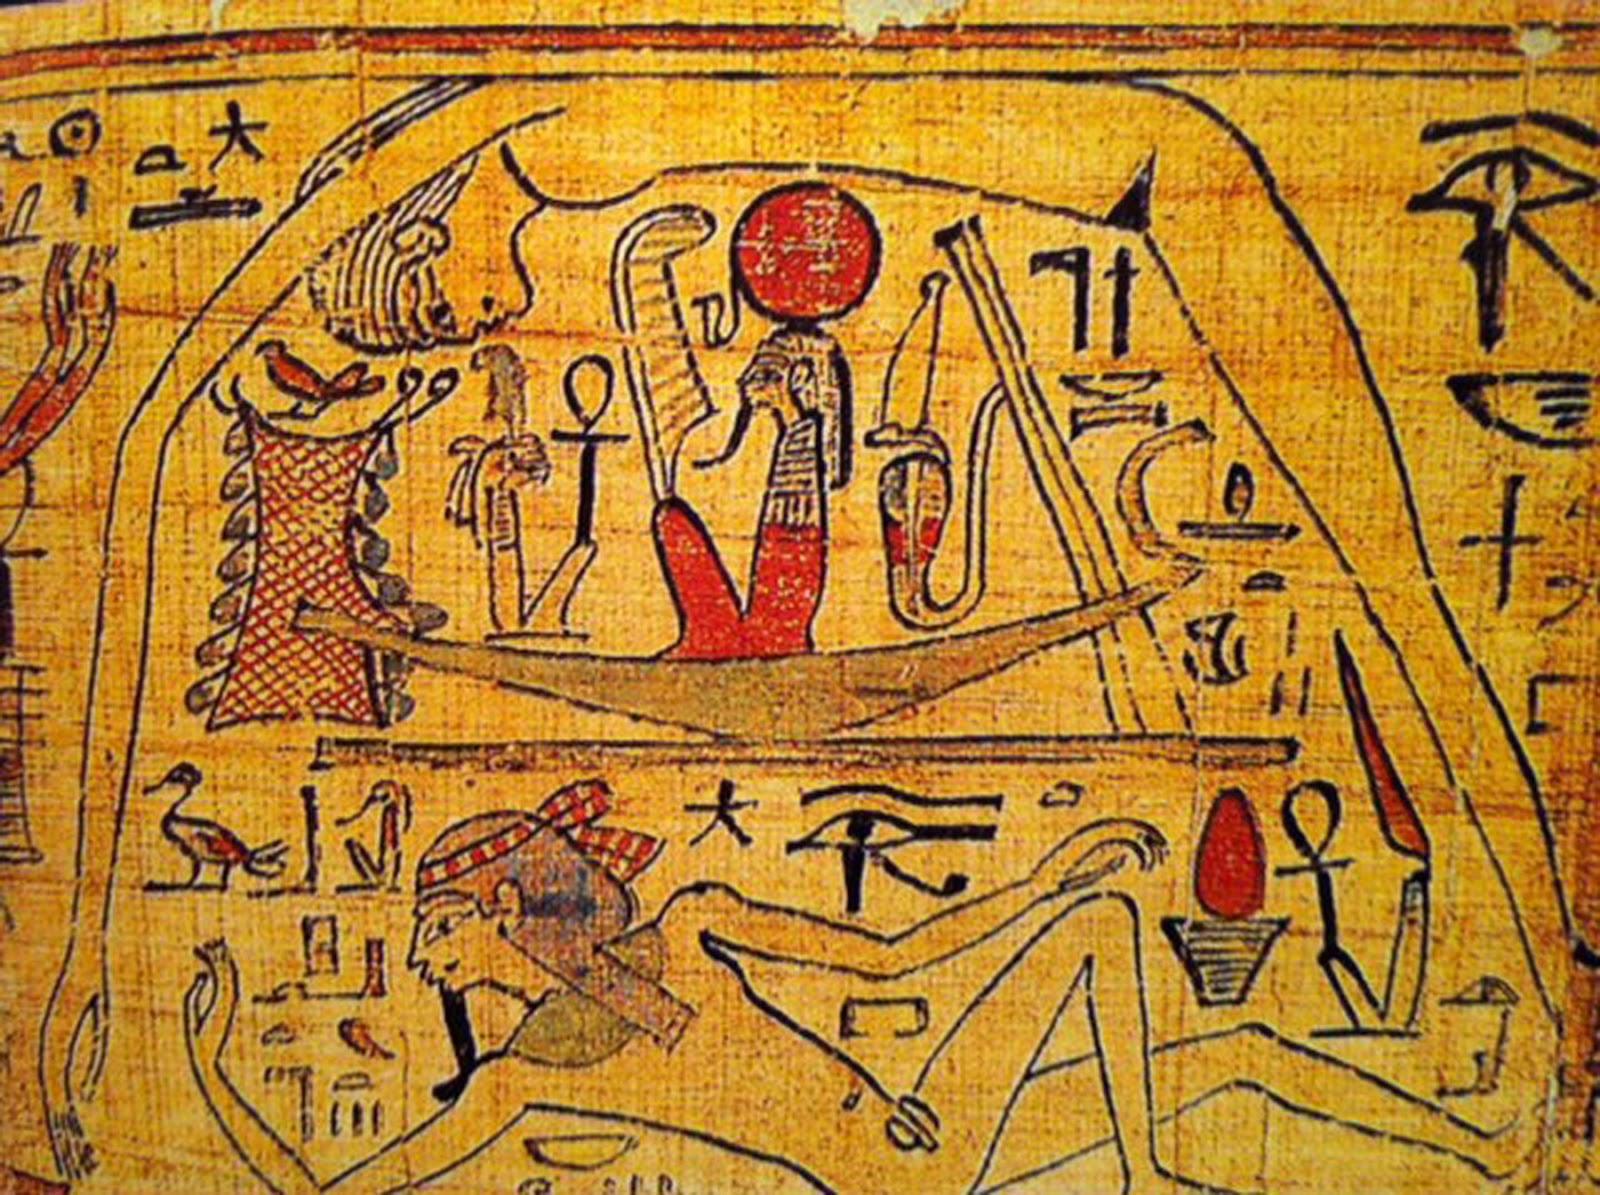 eugene ray architect: aesthetics in ancient egypt> radiant/powerful